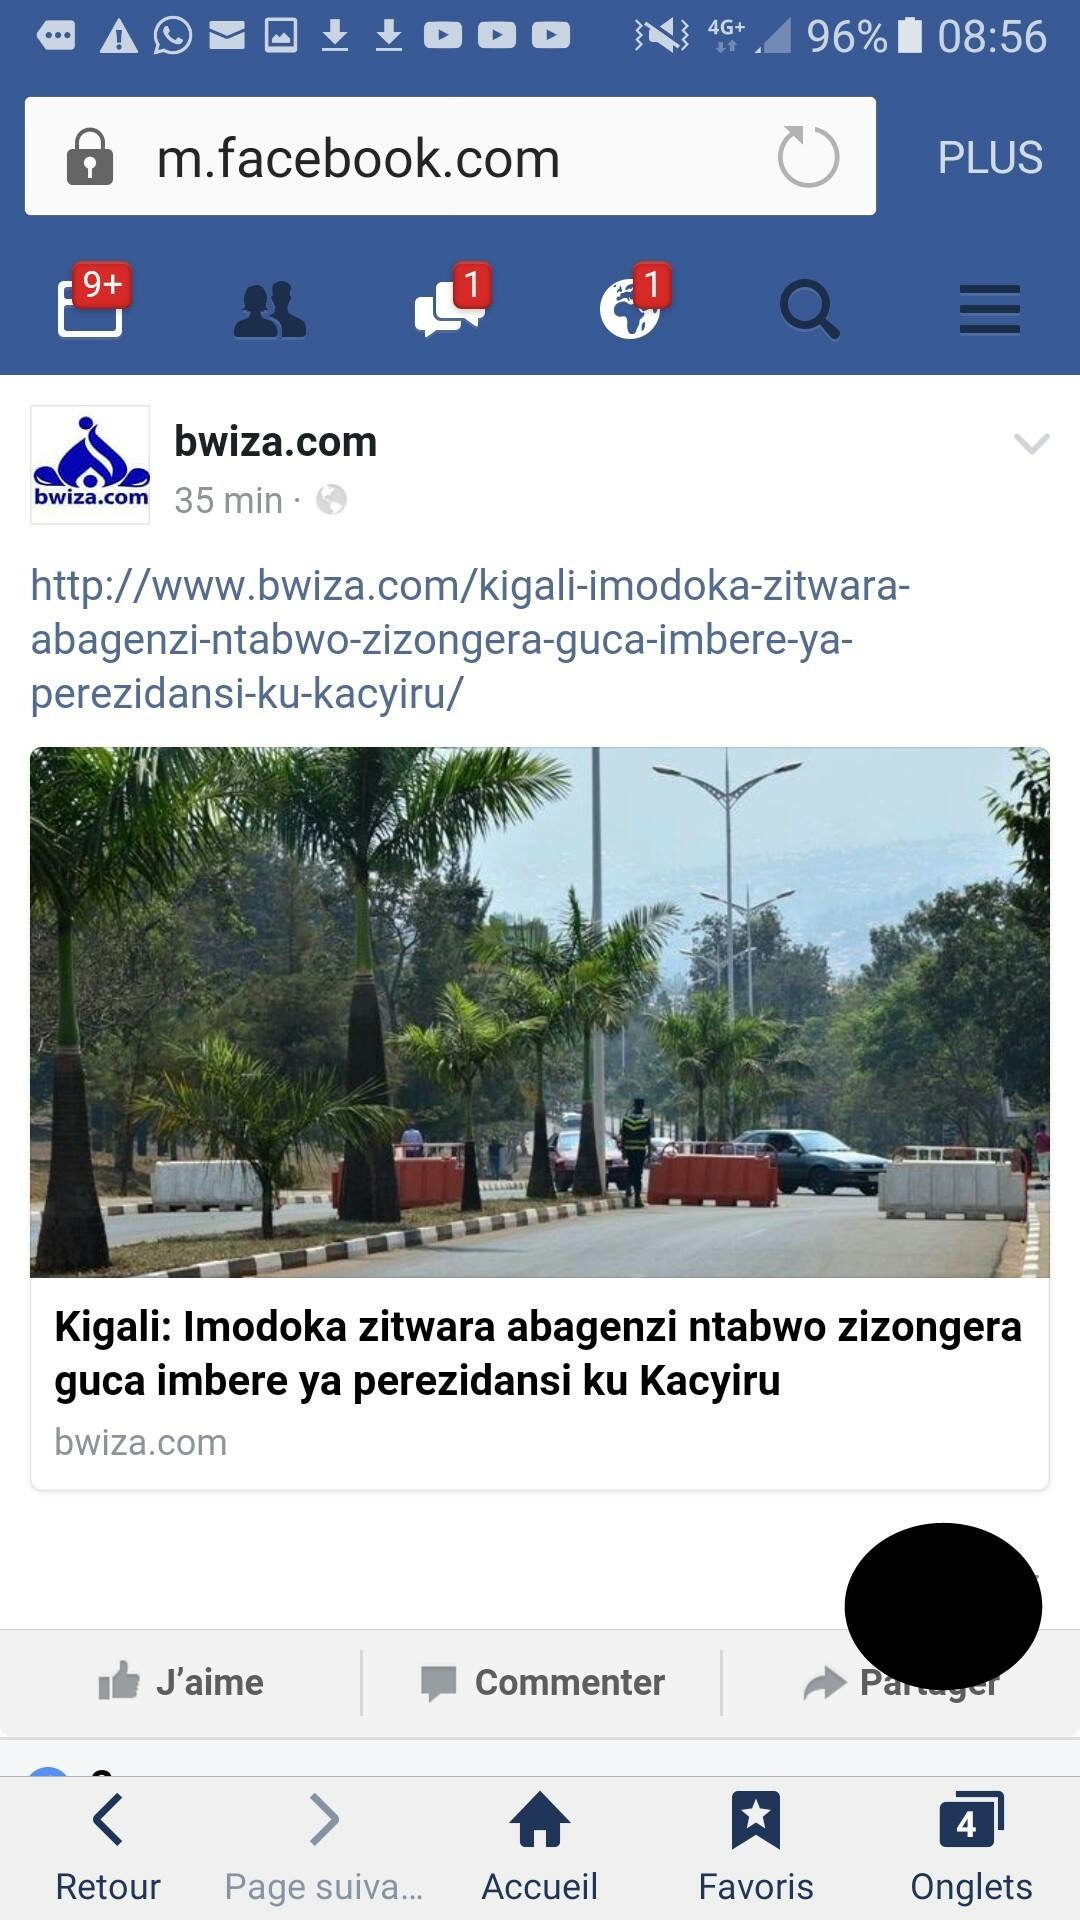 Nyuma yo gufunga imihanda yo mu Kiyovu kubera ubwoba Kagame yafunze umuhanda wa Kakiru